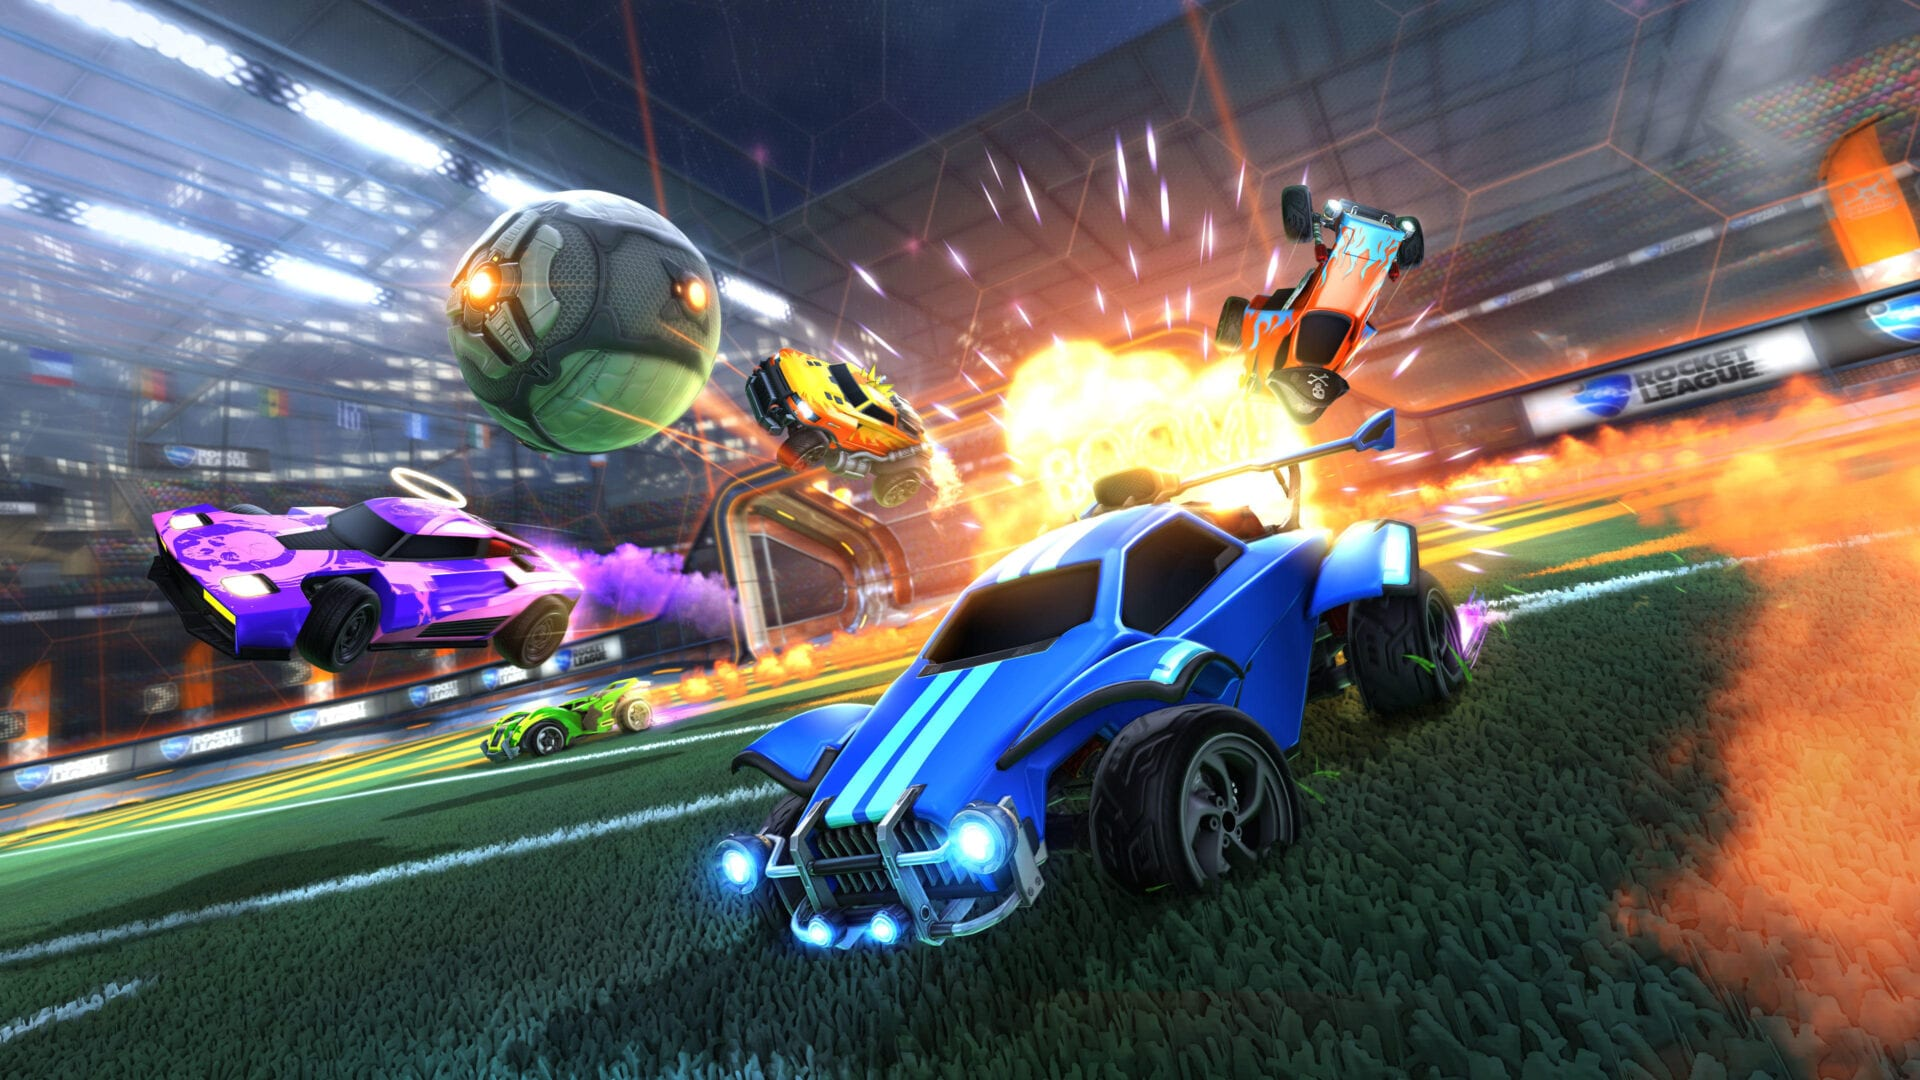 rocket league fortnite llama-rama challenges